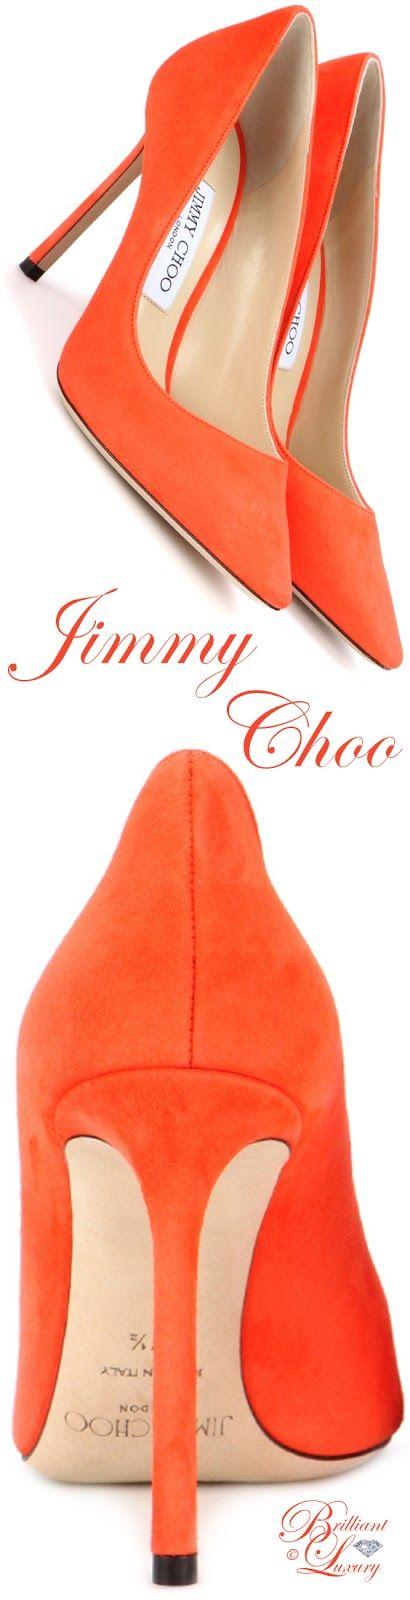 Brilliant Luxury by Emmy DE ♦ Jimmy Choo 'Romy' Suede Pumps